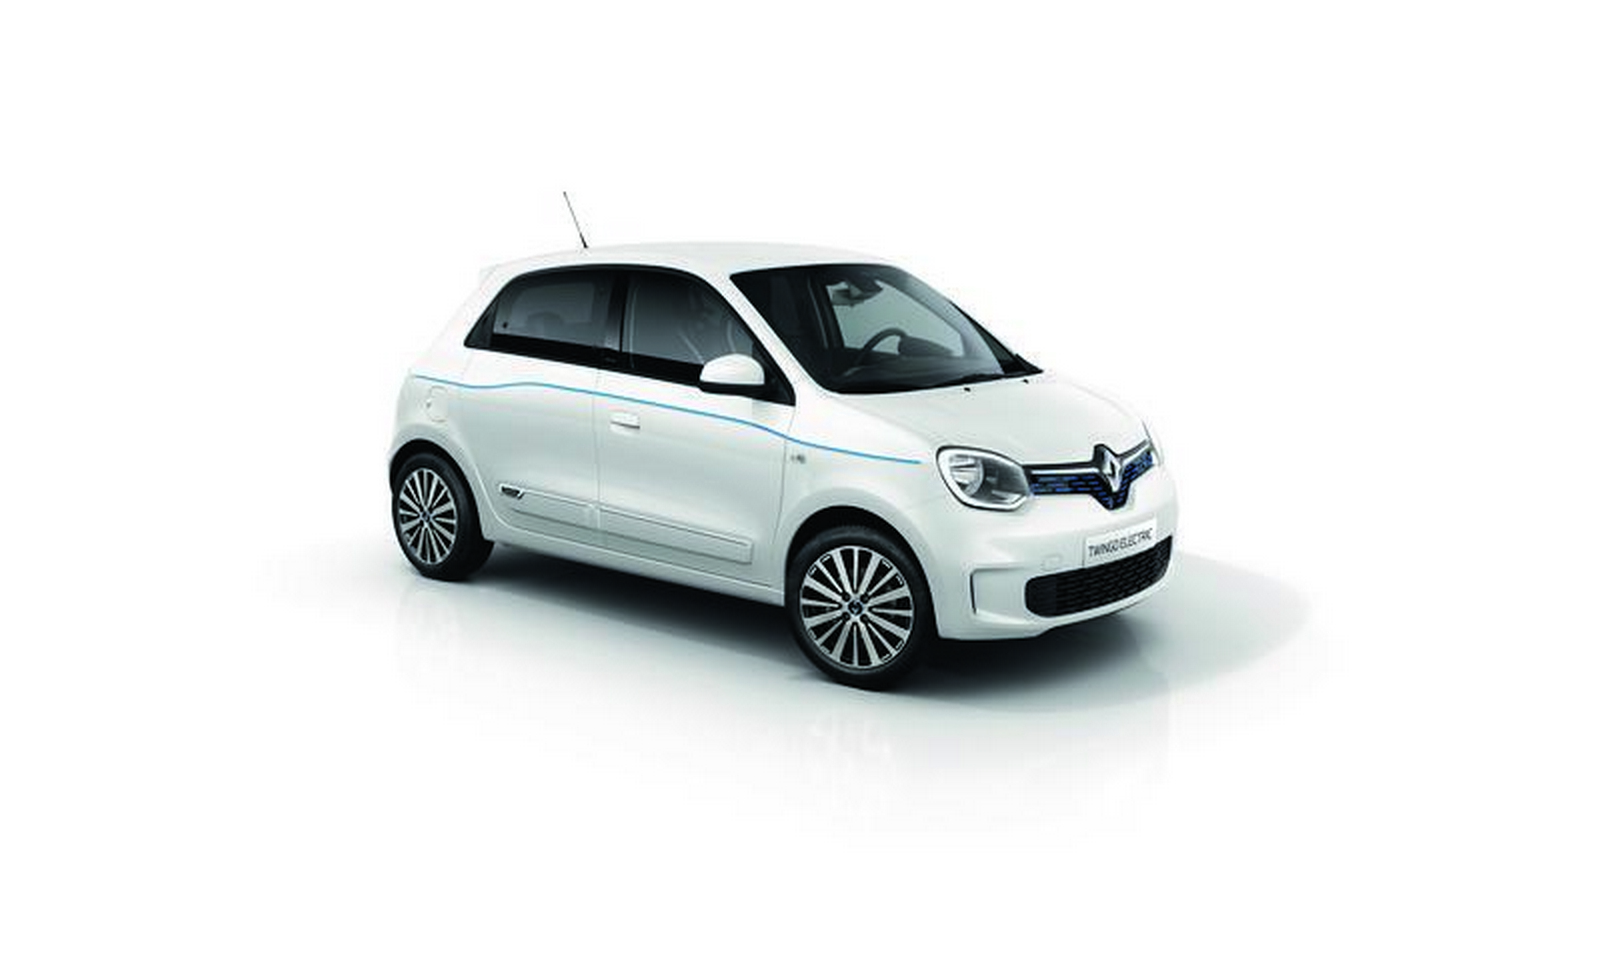 Renault Twingo Electric: ecco quanto costa